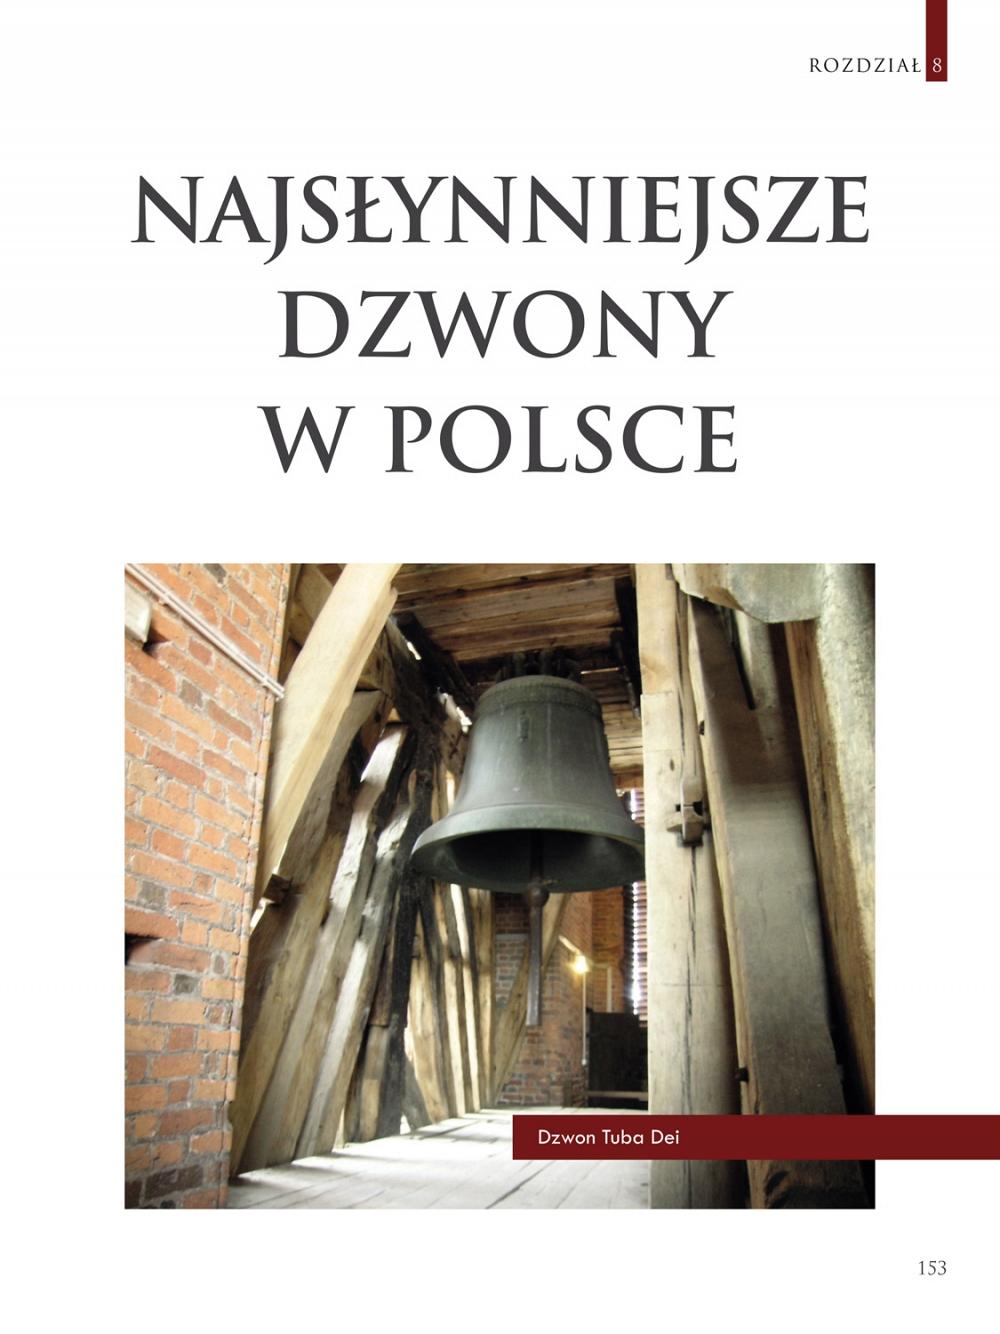 Dzwon Historia Symbolika I Funkcja